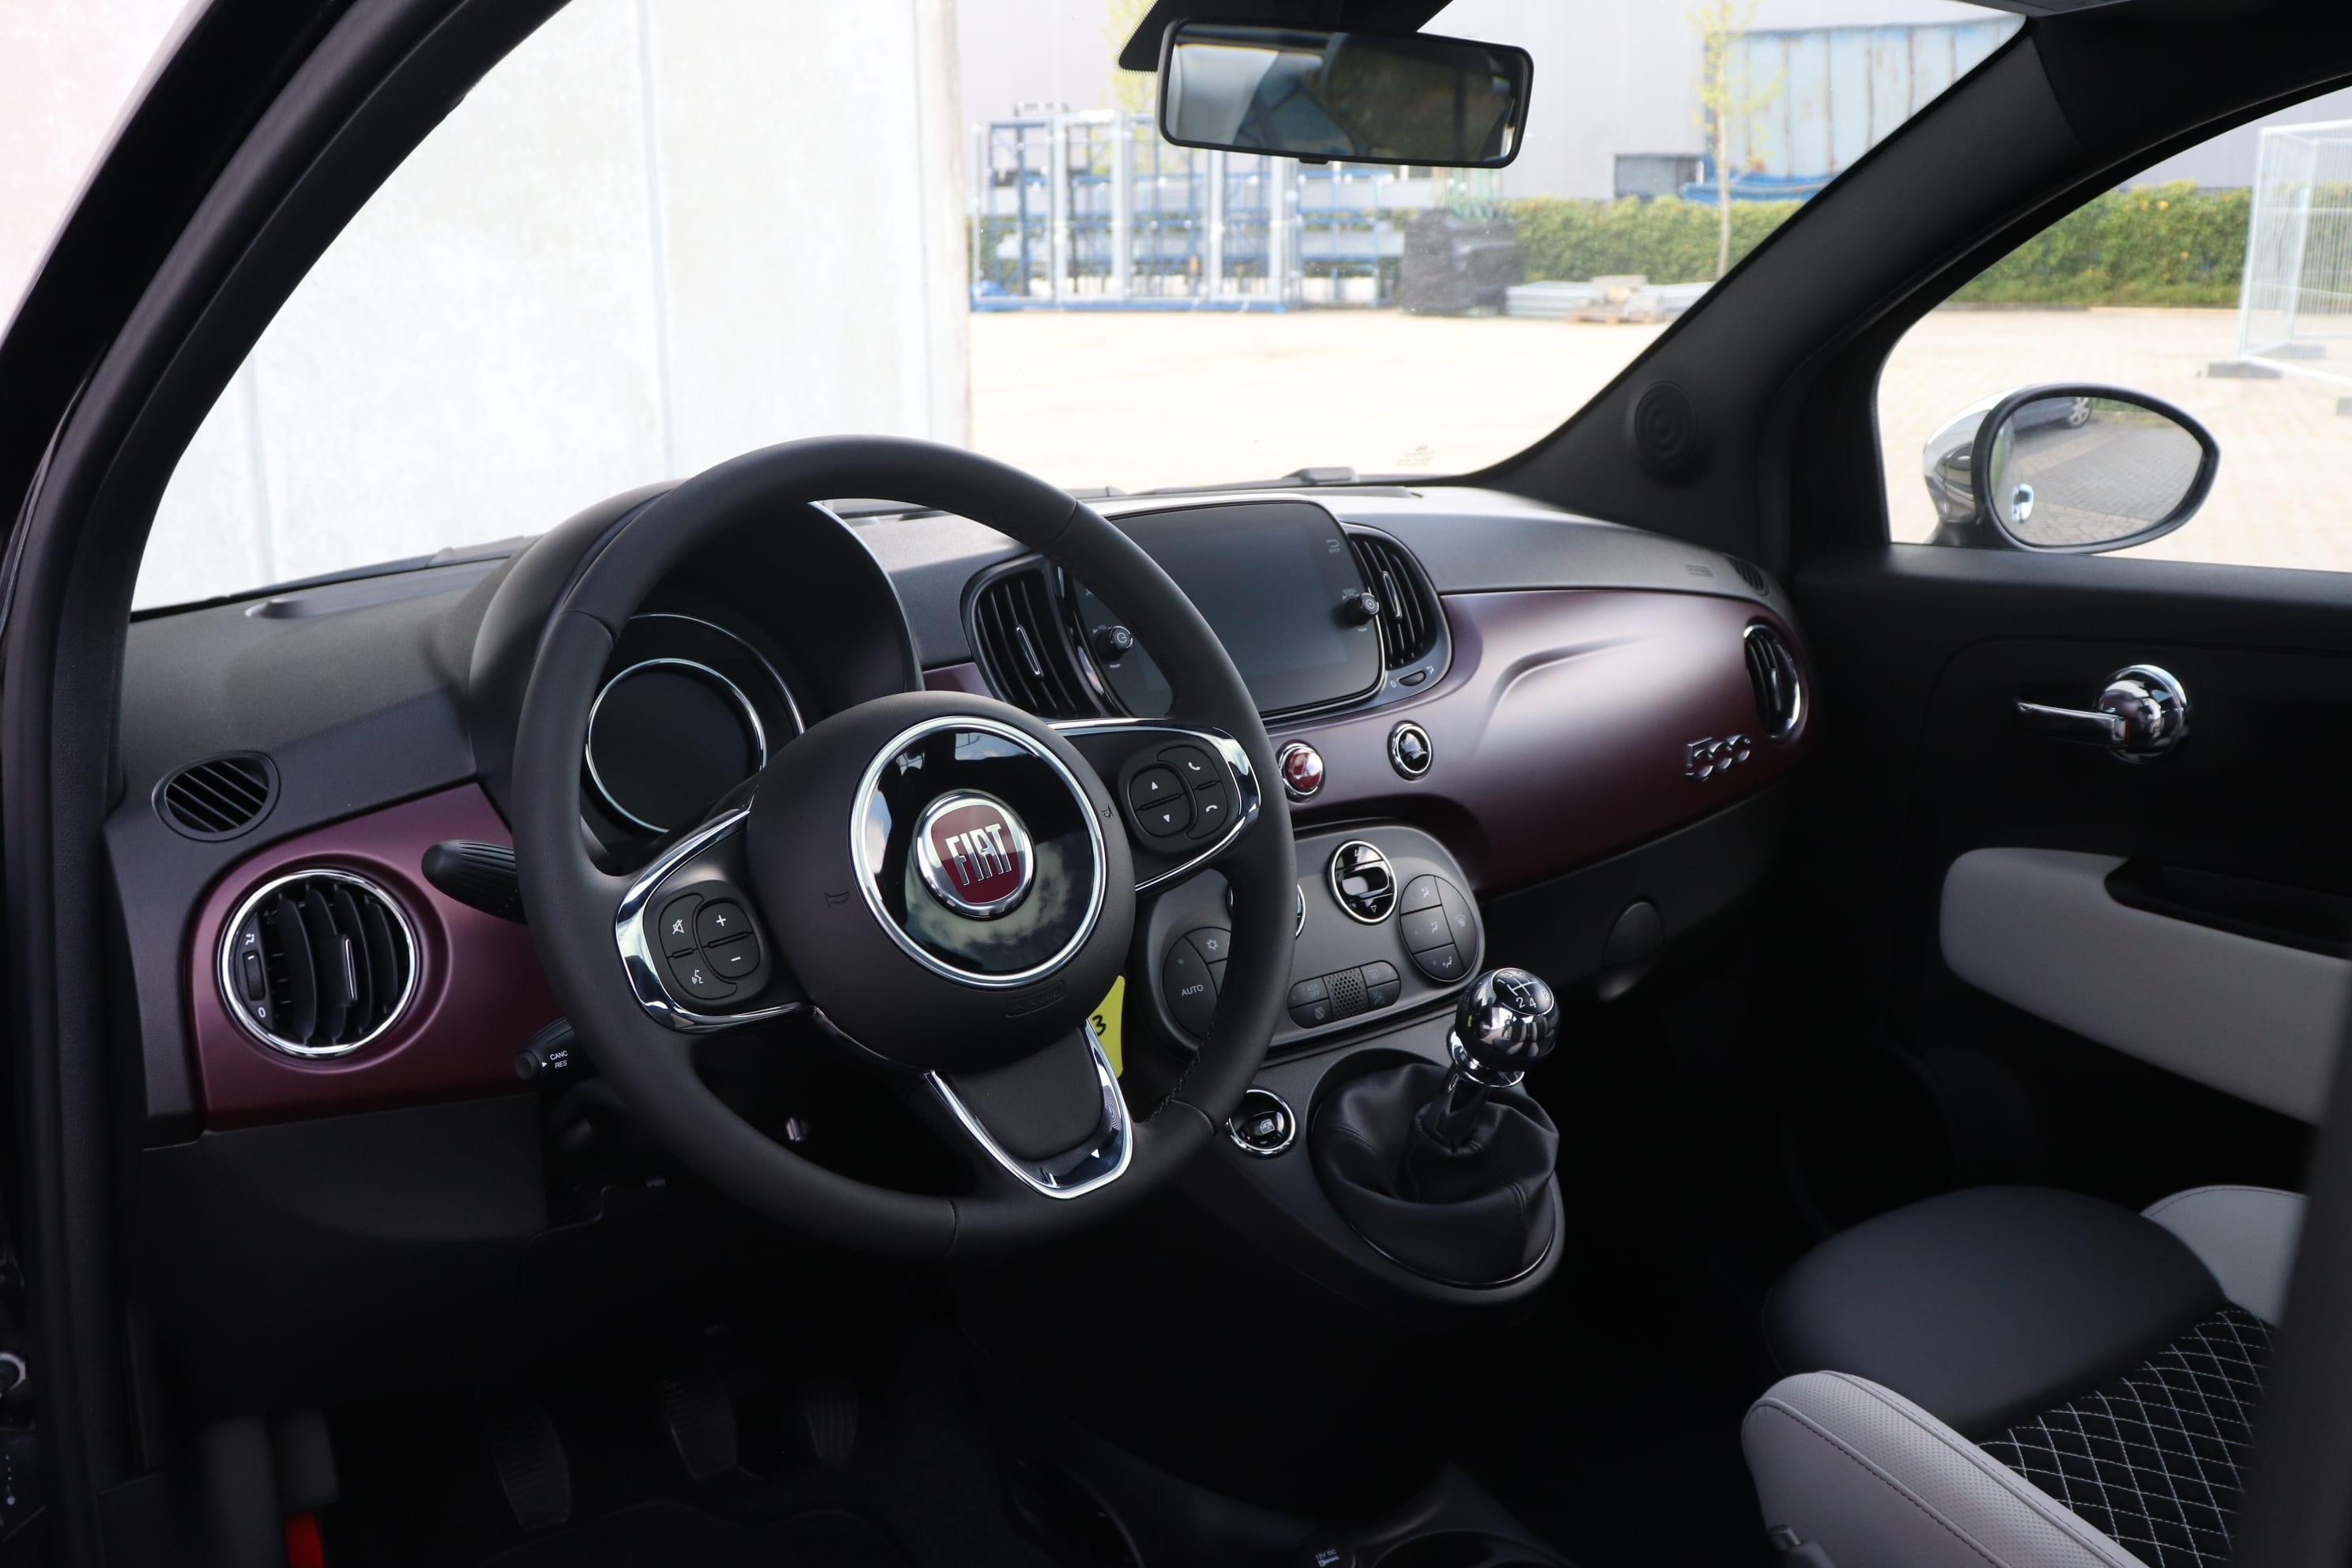 Fiat 500 1.2 Star - dashboard